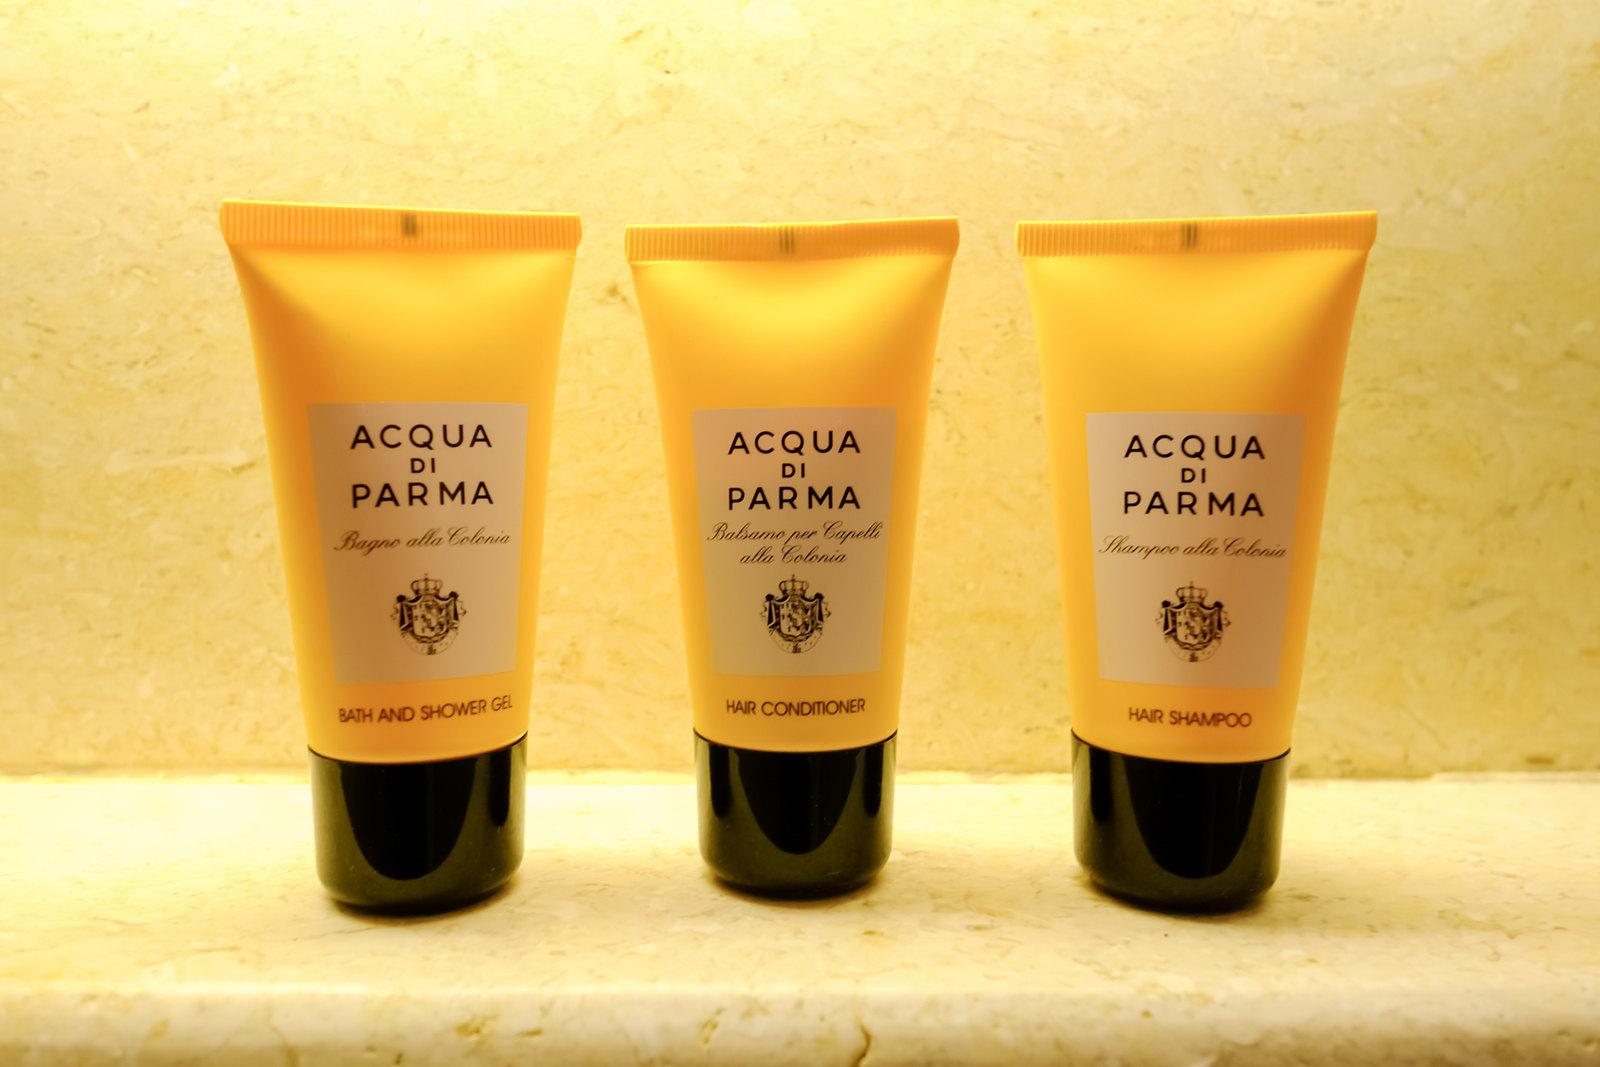 Acqua di Parma amenities